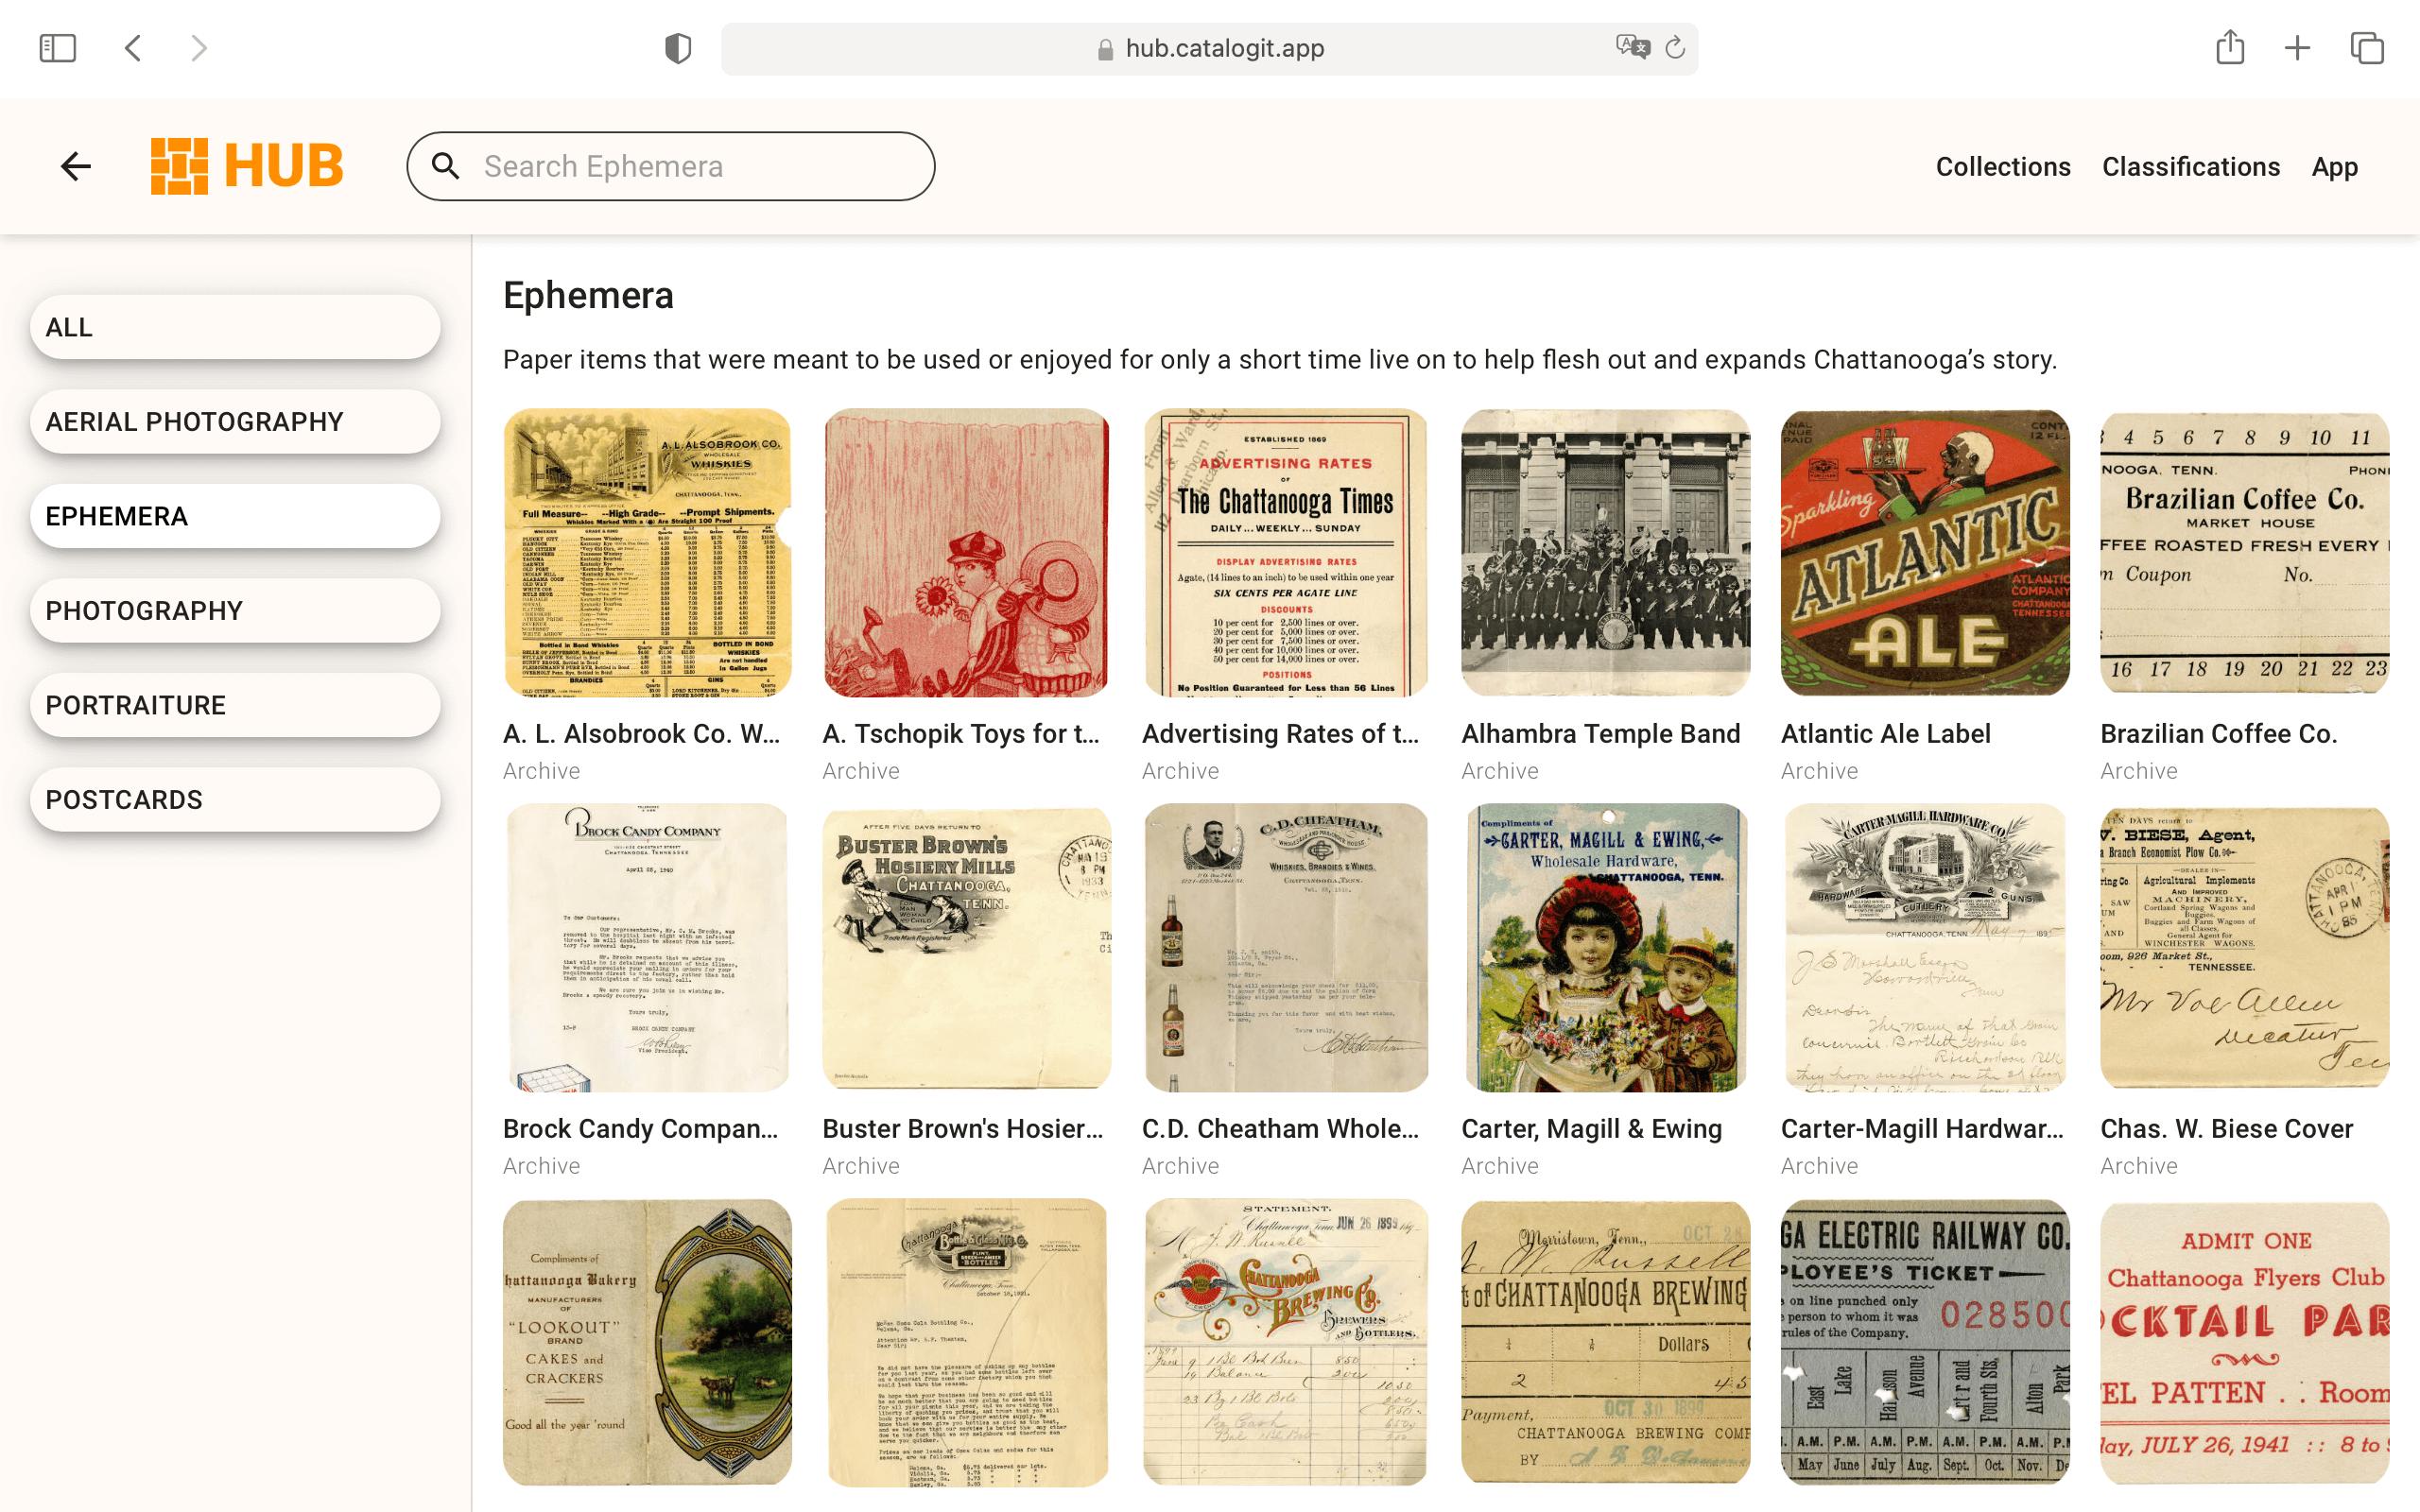 A screenshot of Picnooga's CatalogIt HUB page.